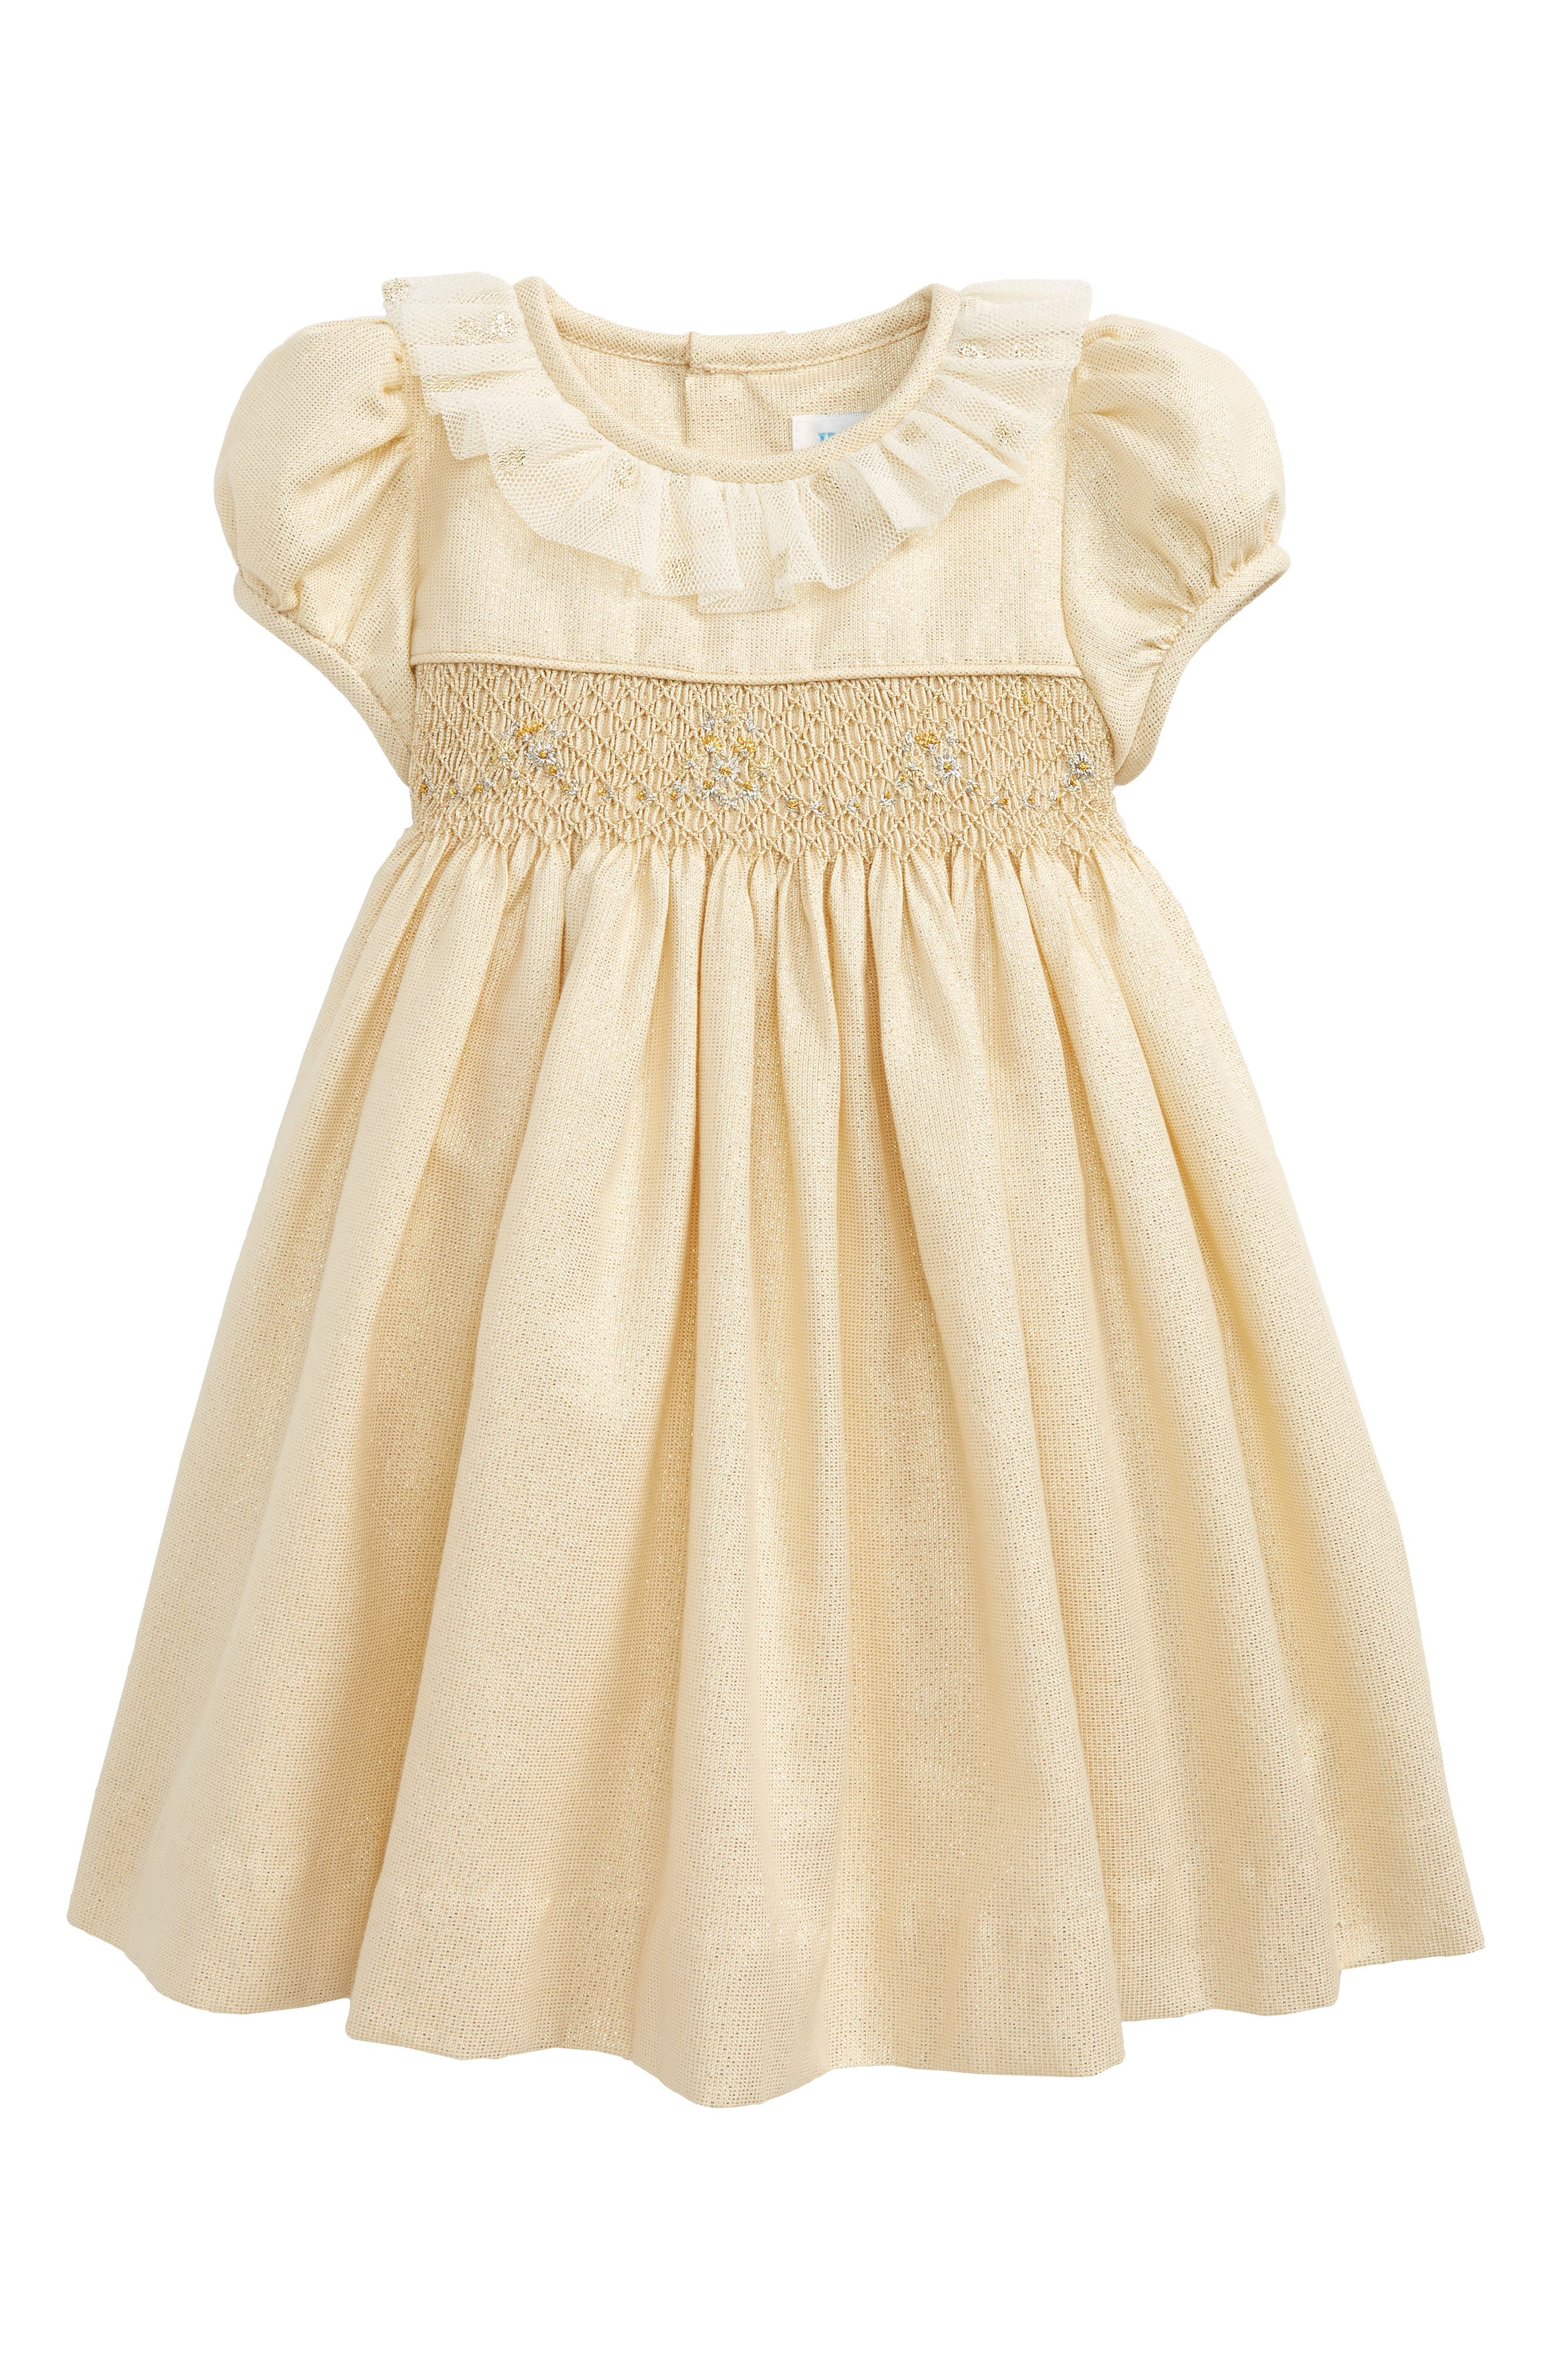 Main Image - Luli & Me Jacquard Smocked Dress (Baby Girls)